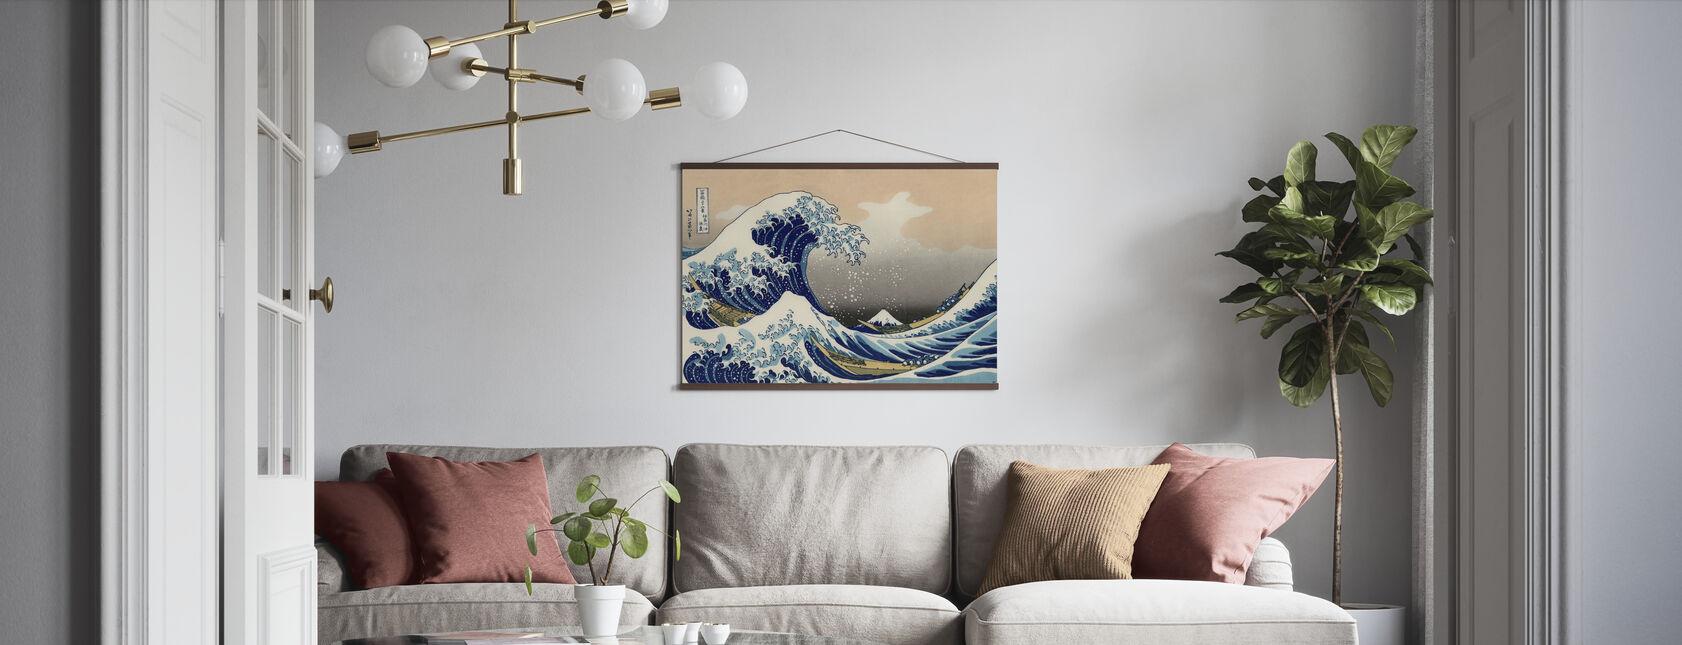 Stora Vågen, Katsushika Hokusai - Poster - Vardagsrum